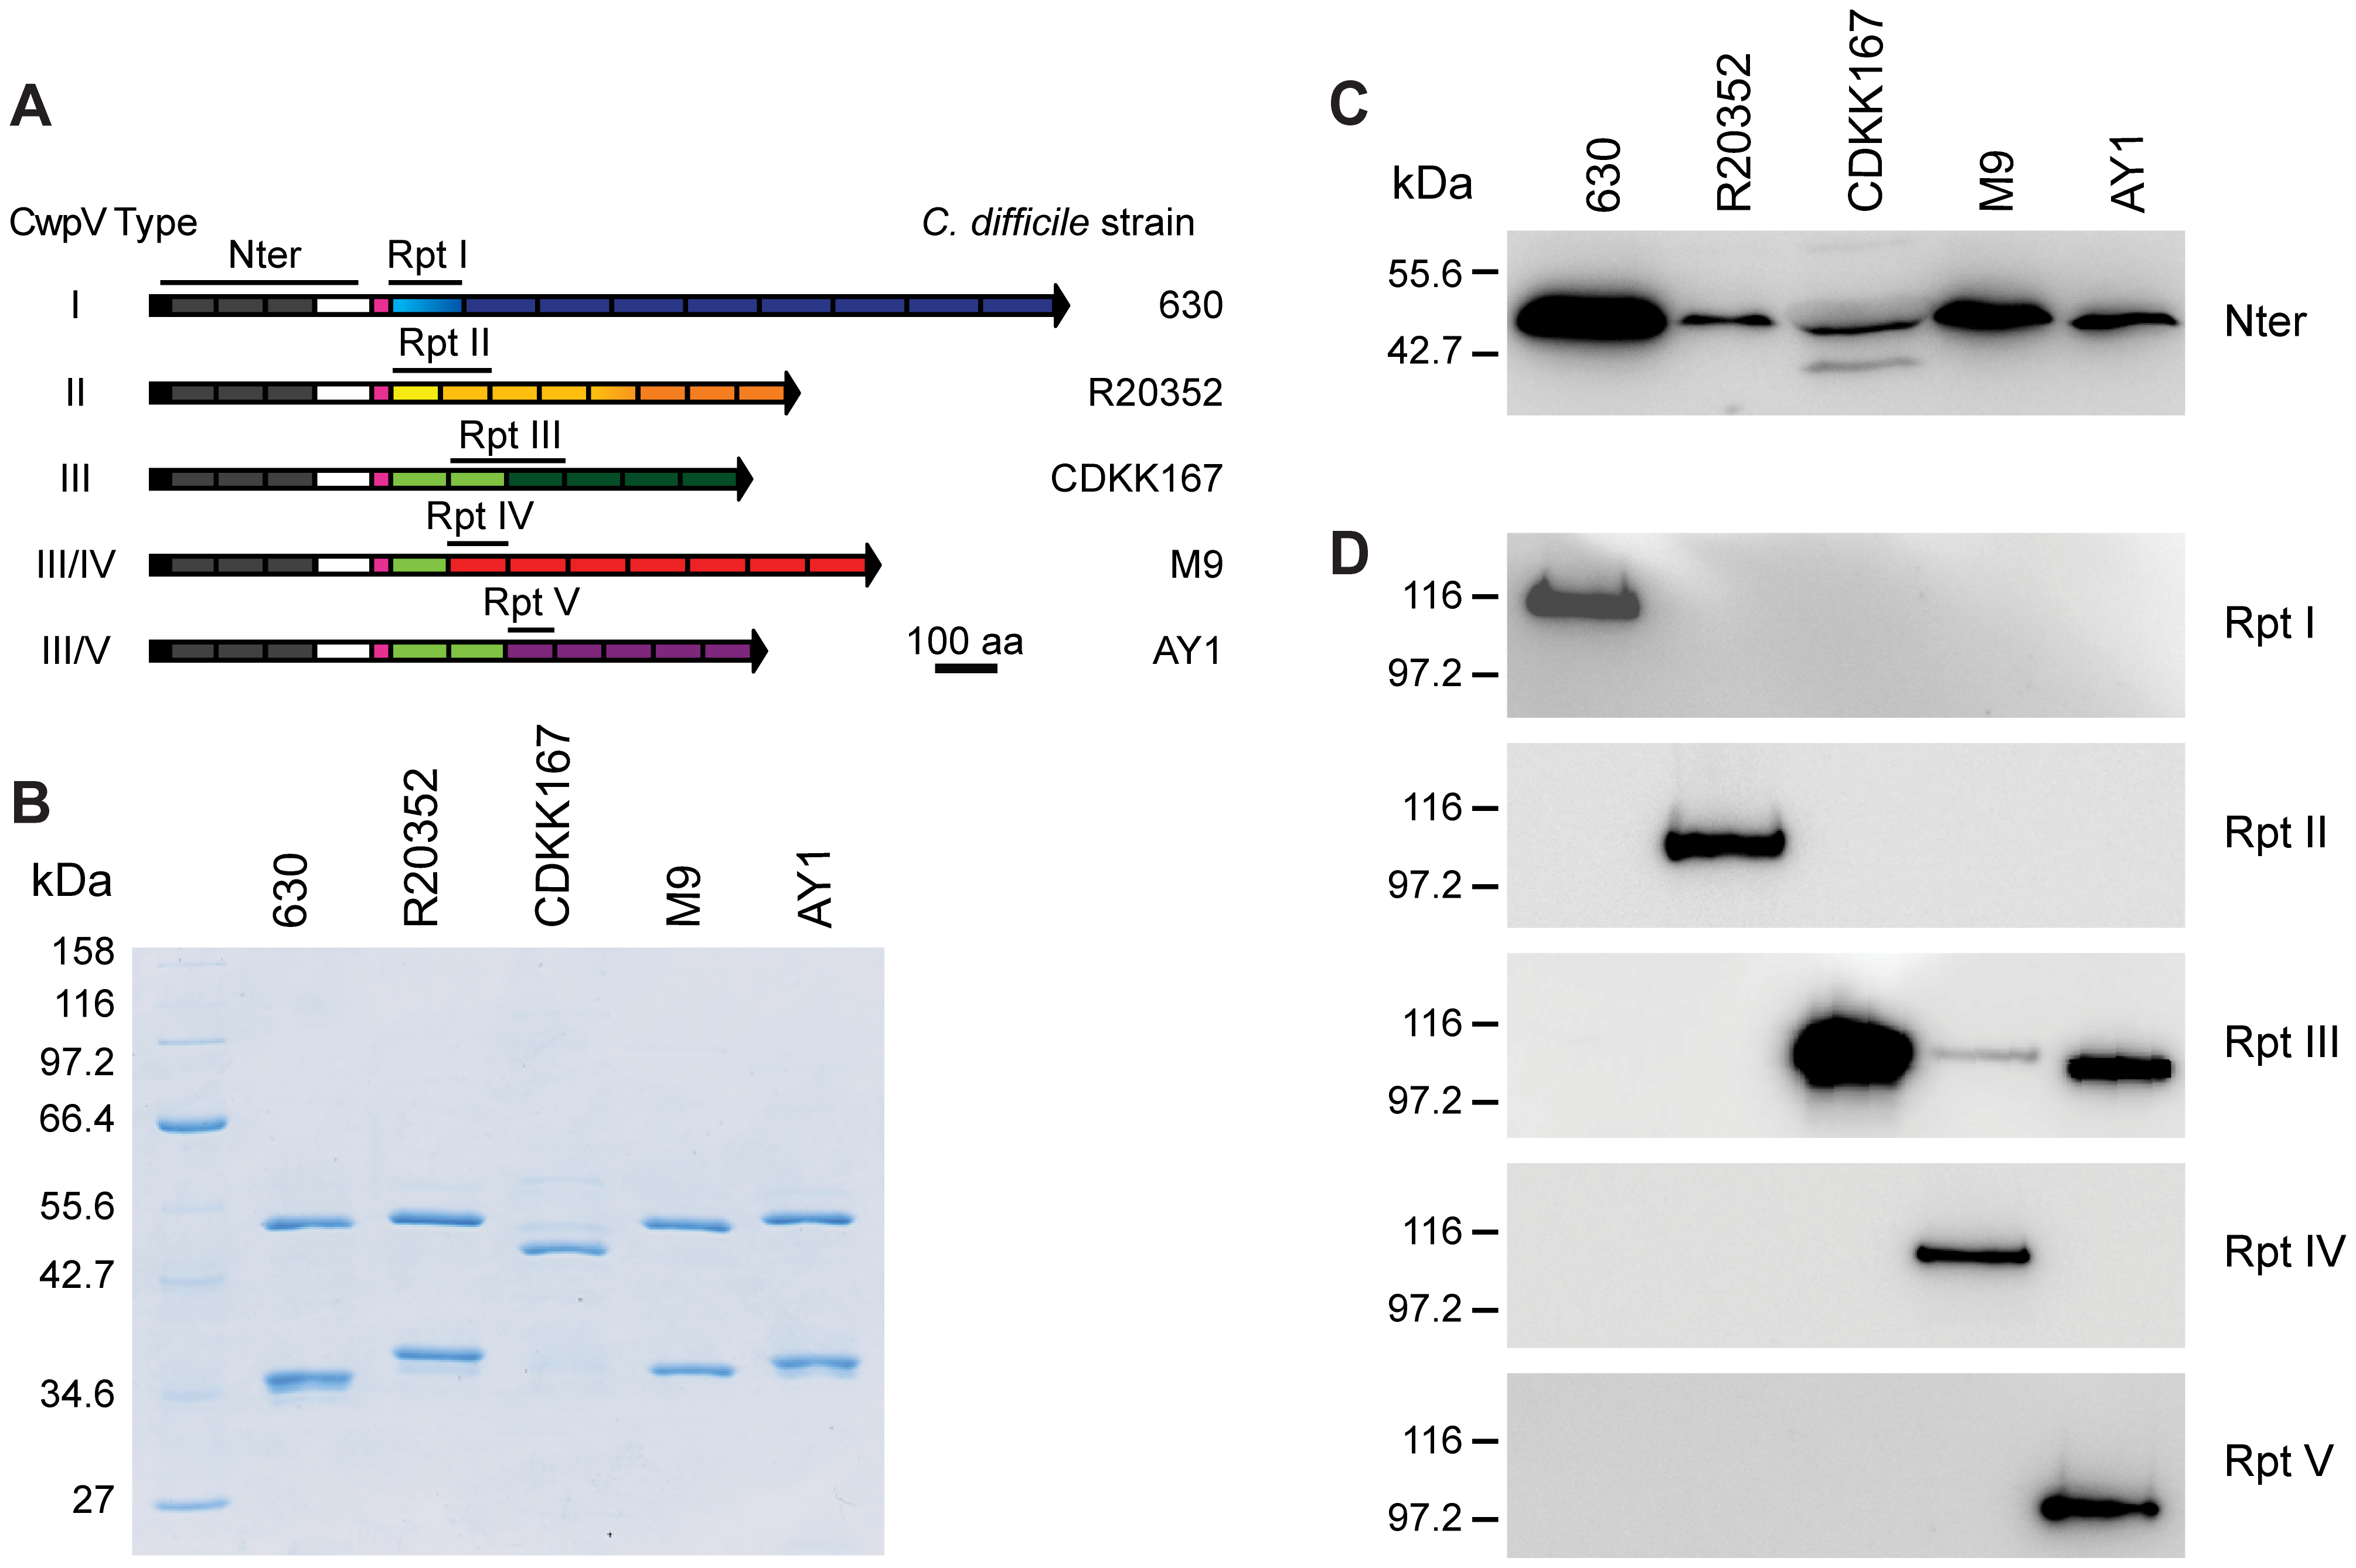 CwpV repeat types are antigenically distinct.